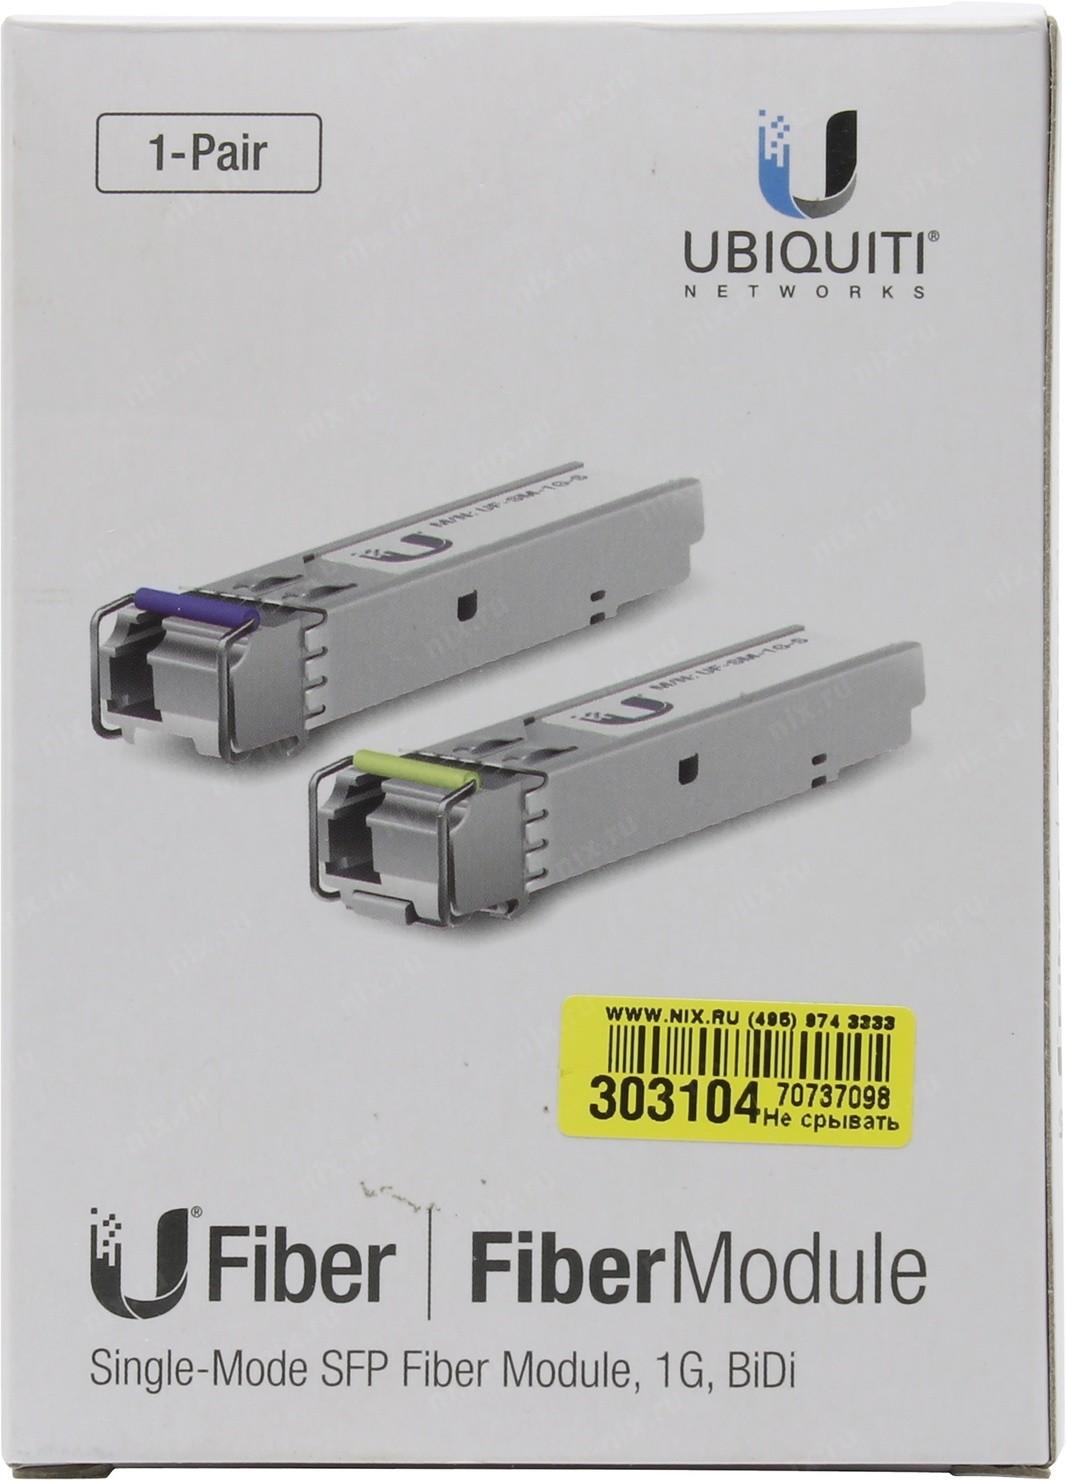 Модули SFP UBIQUITI UF-SM-1G-S — купить, цена и характеристики, отзывы